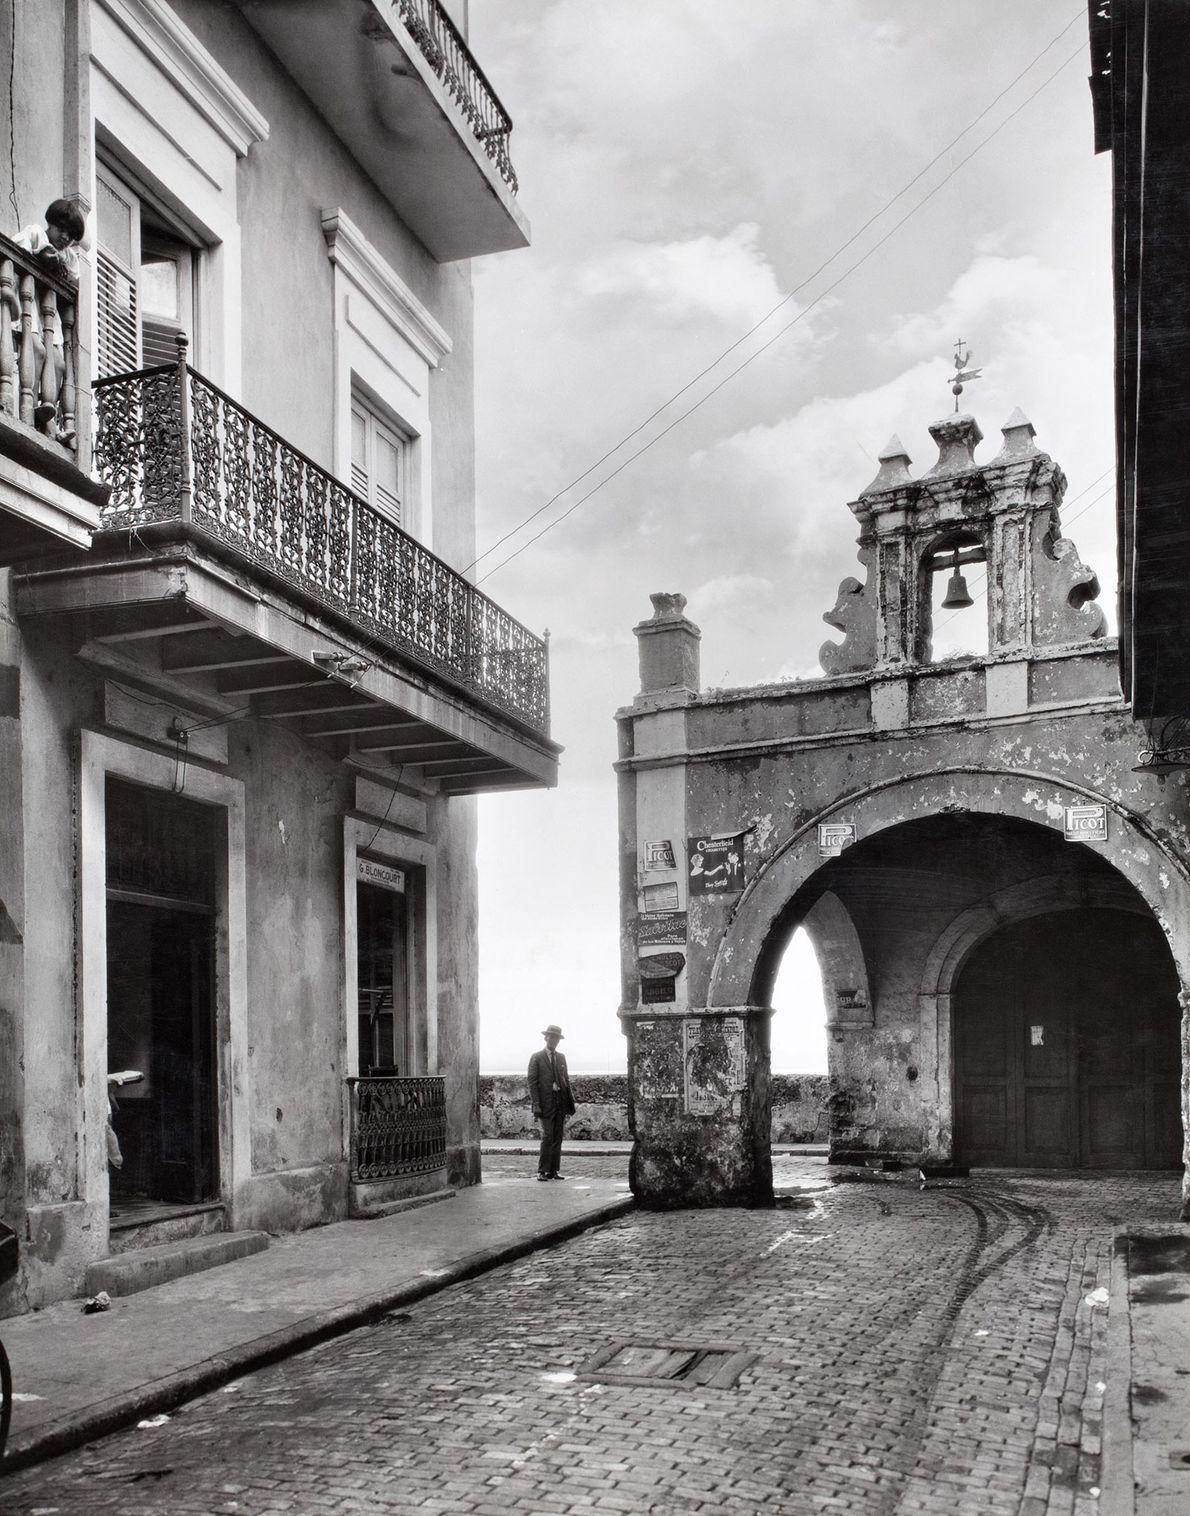 La antigua arquitectura española